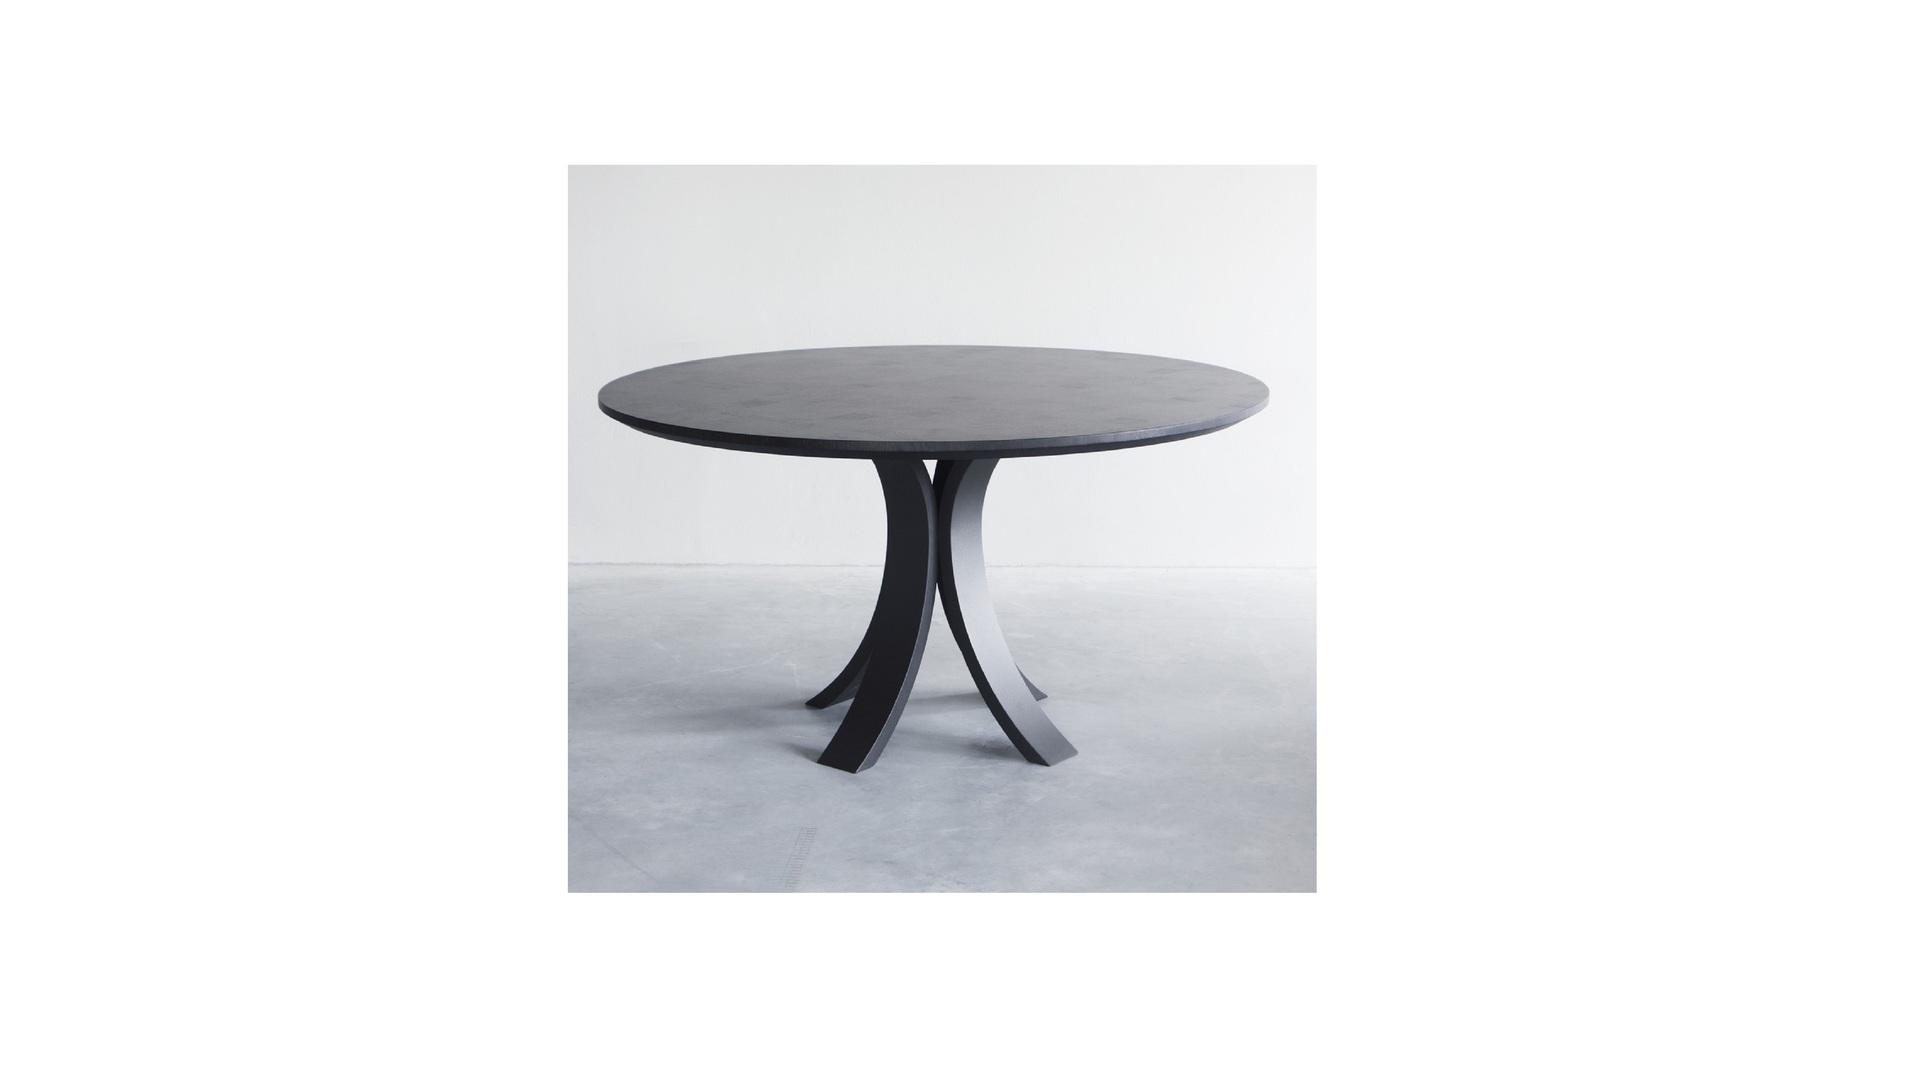 Kops Slim round table (3) klein.jpg